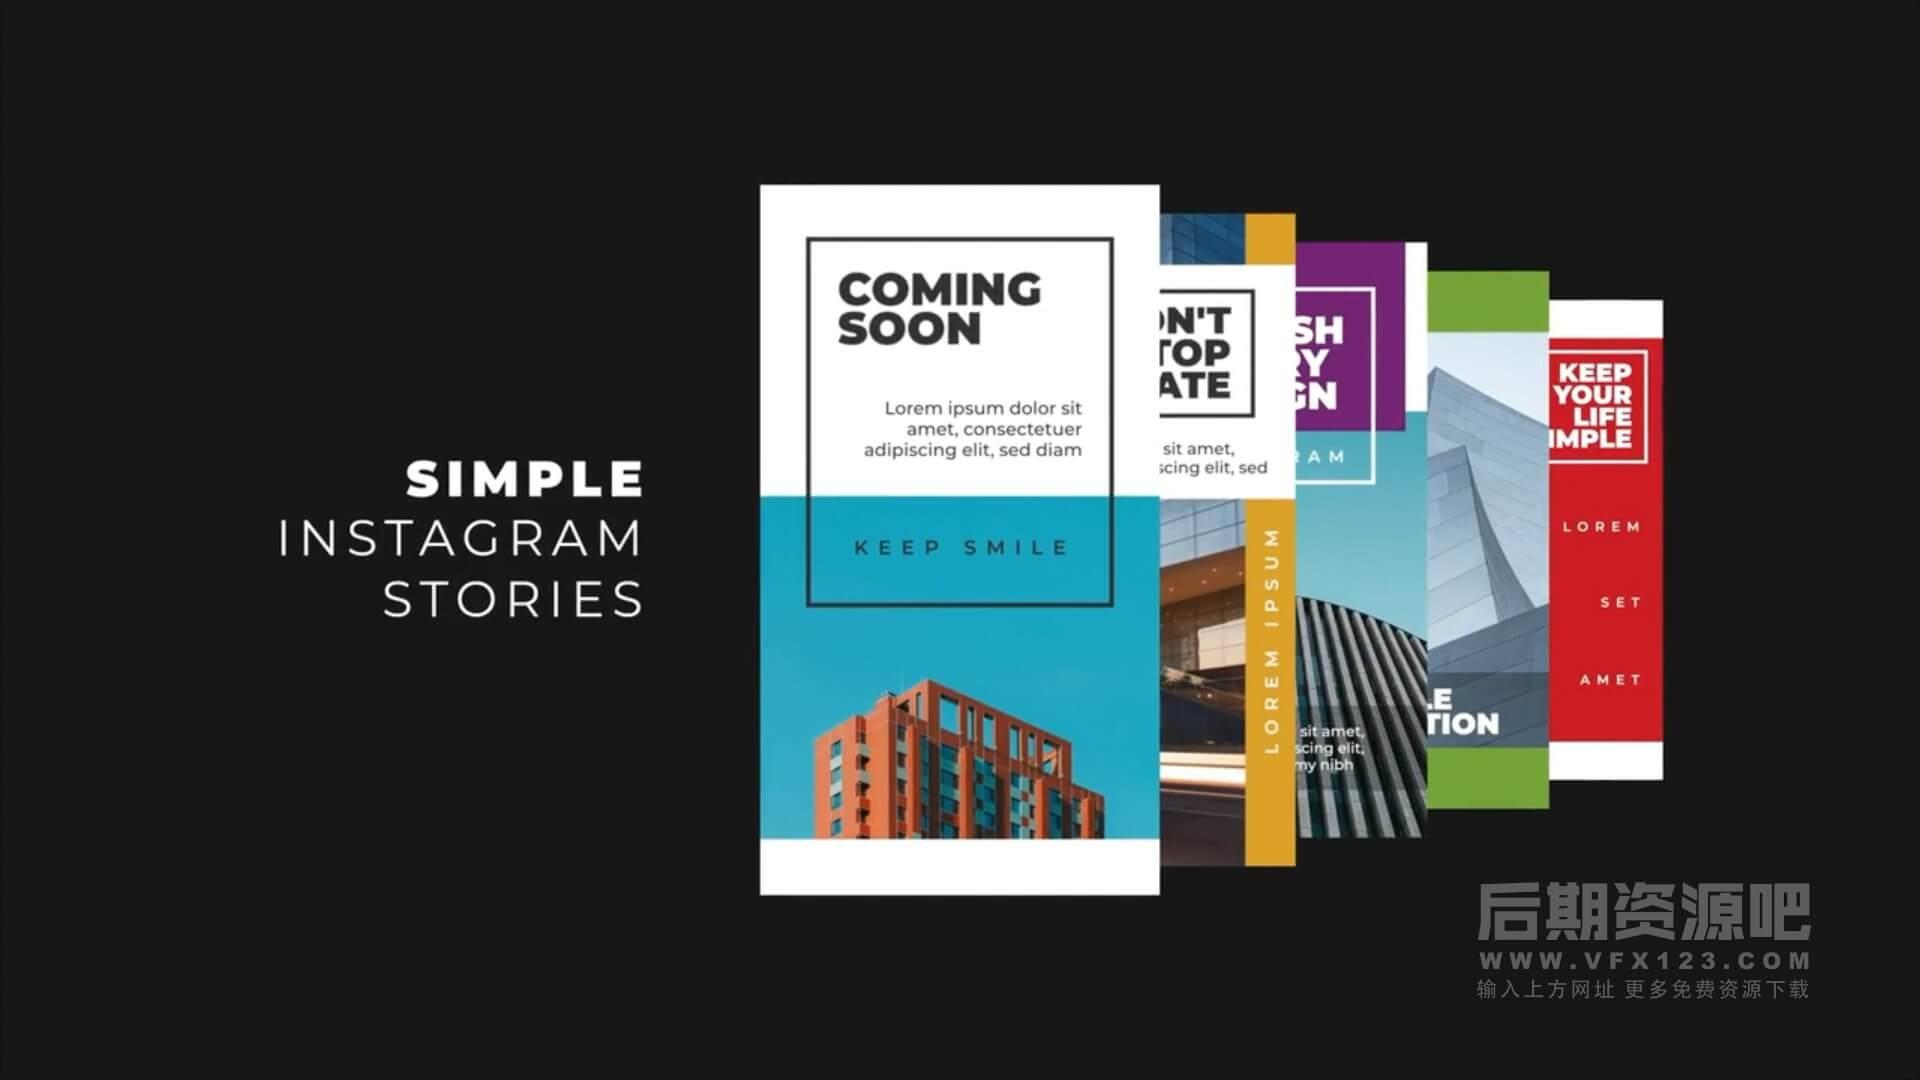 fcpx插件 5组简单干净商务推广类竖屏模板 Simple Ins Stories